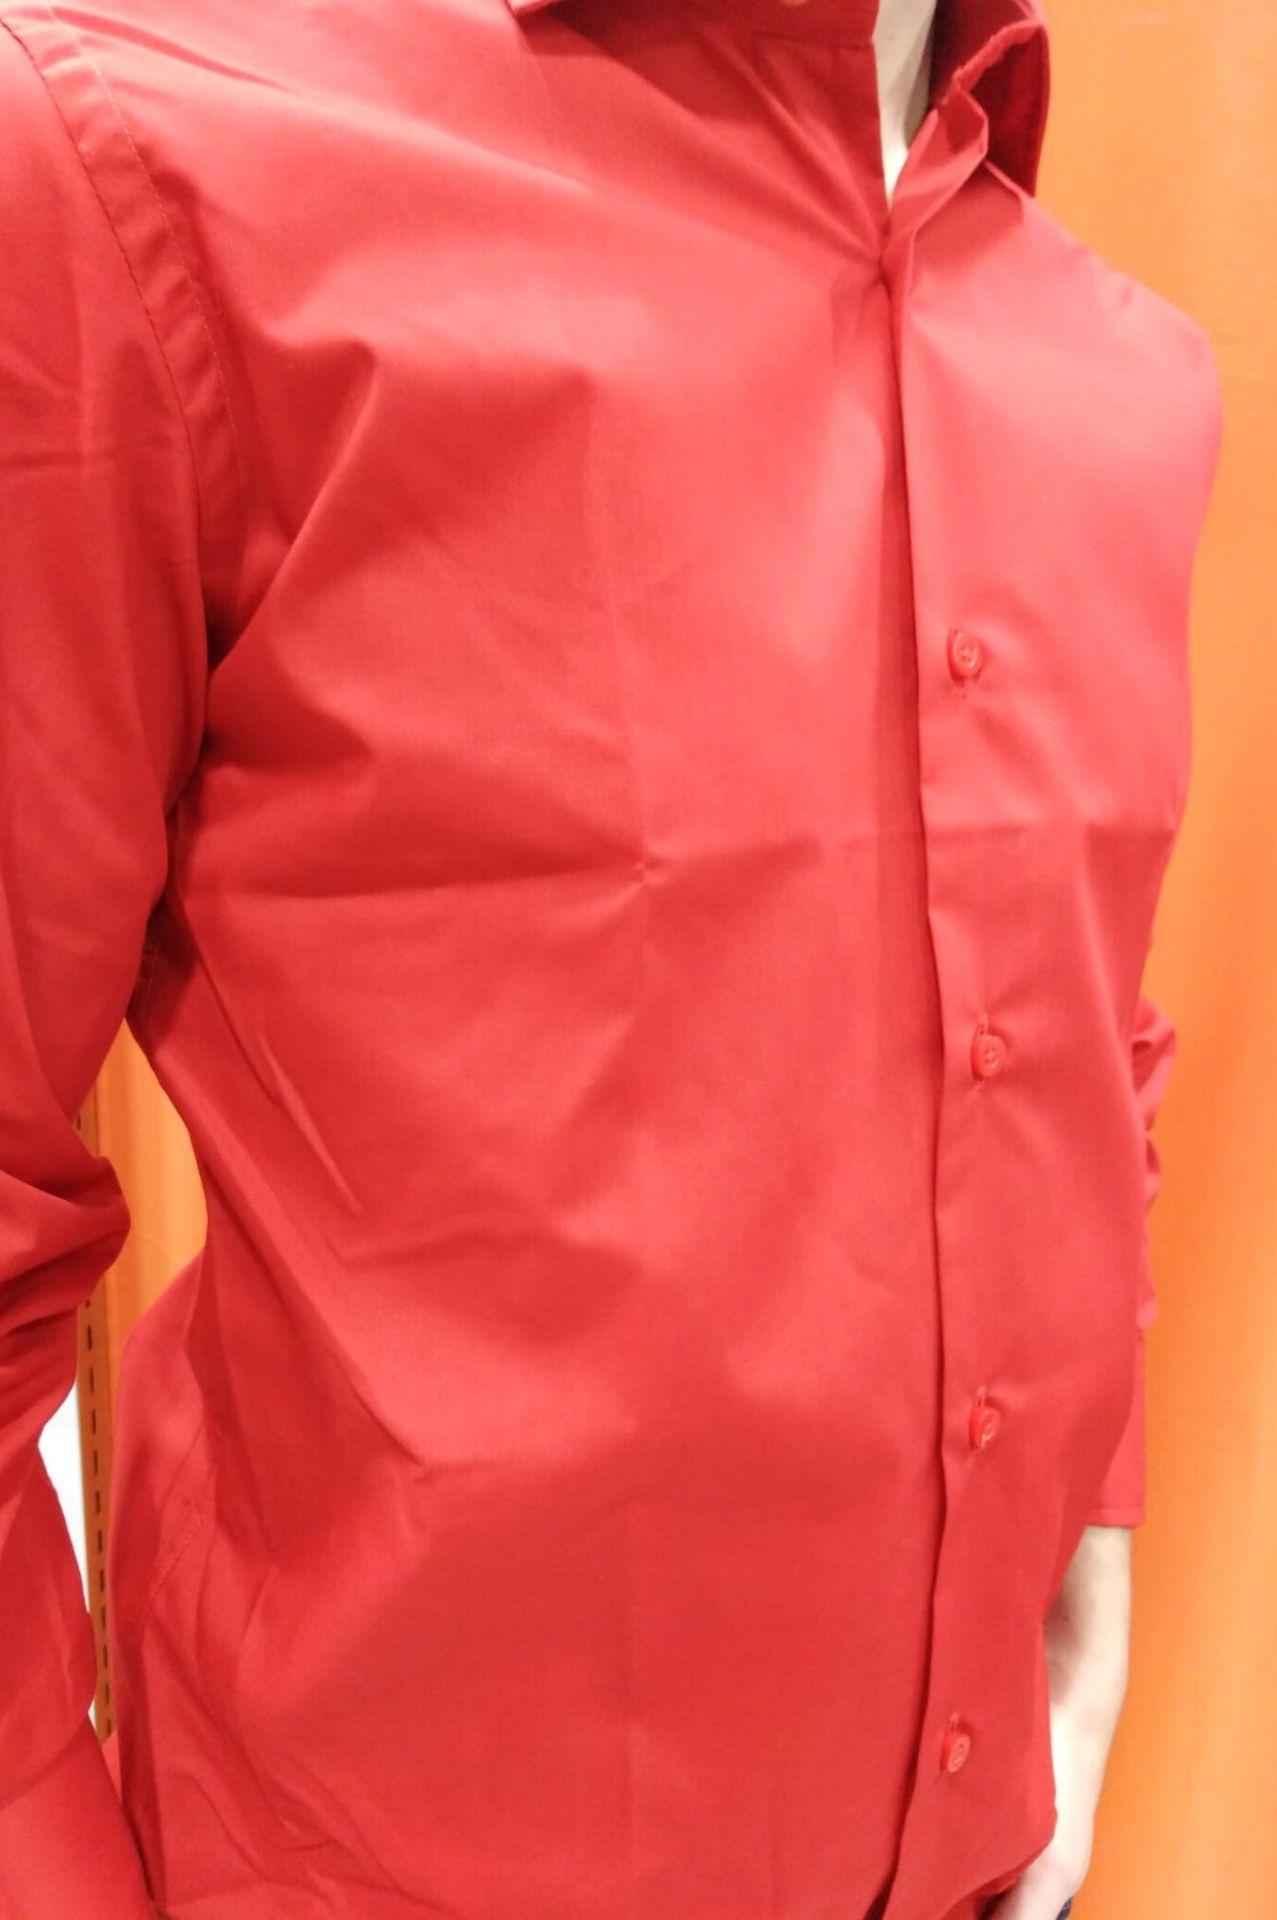 camisa lisa roja derecha